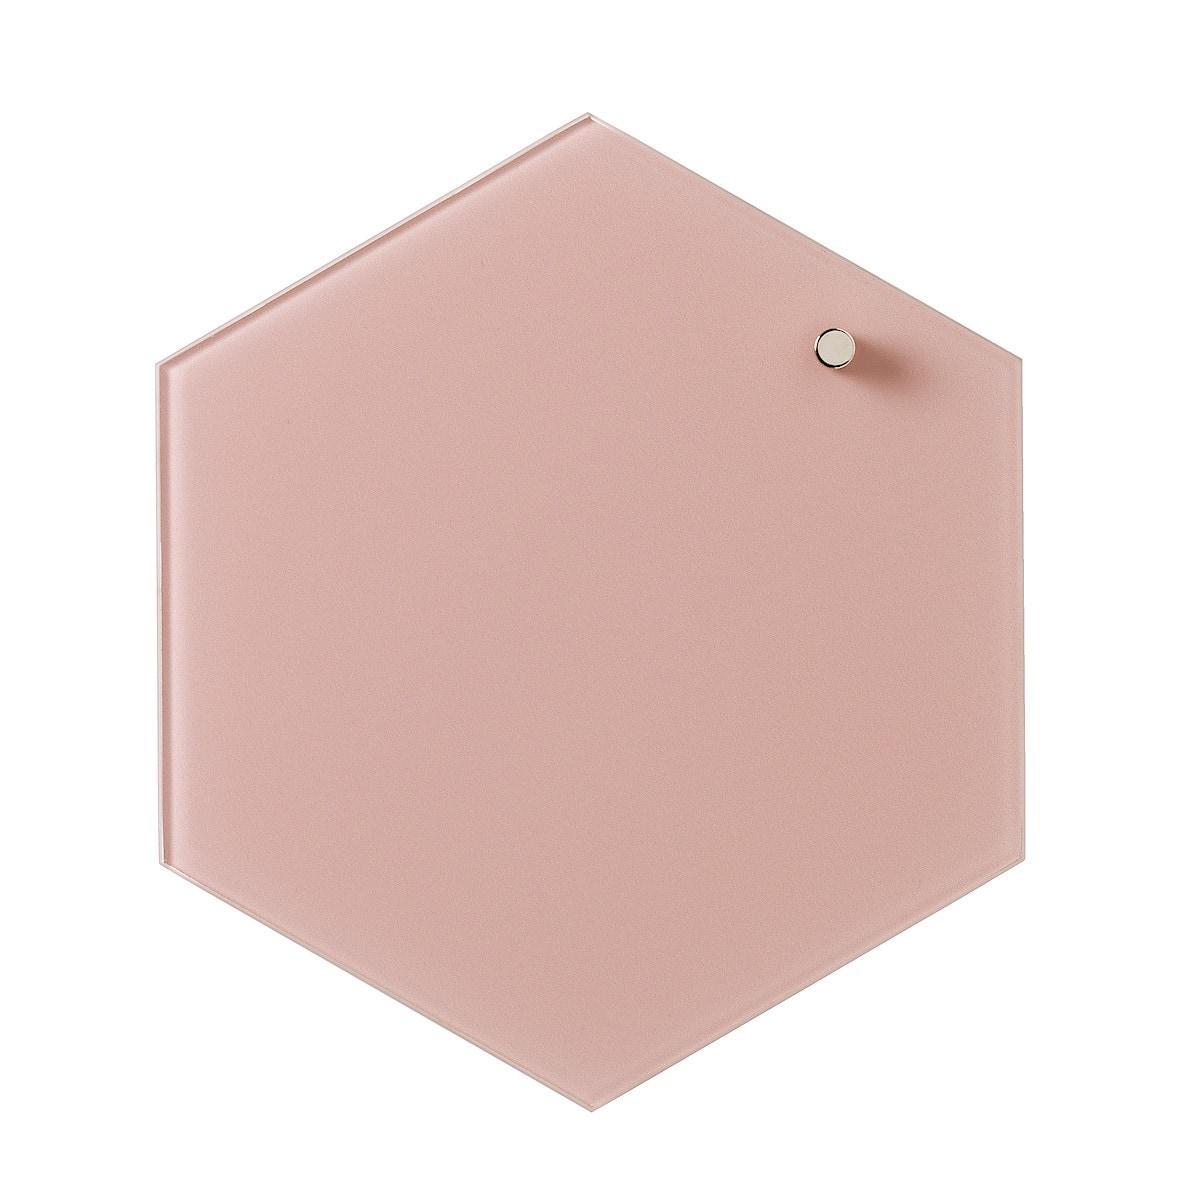 Magnetisk glastavla Naga Hexagonal 21 cm